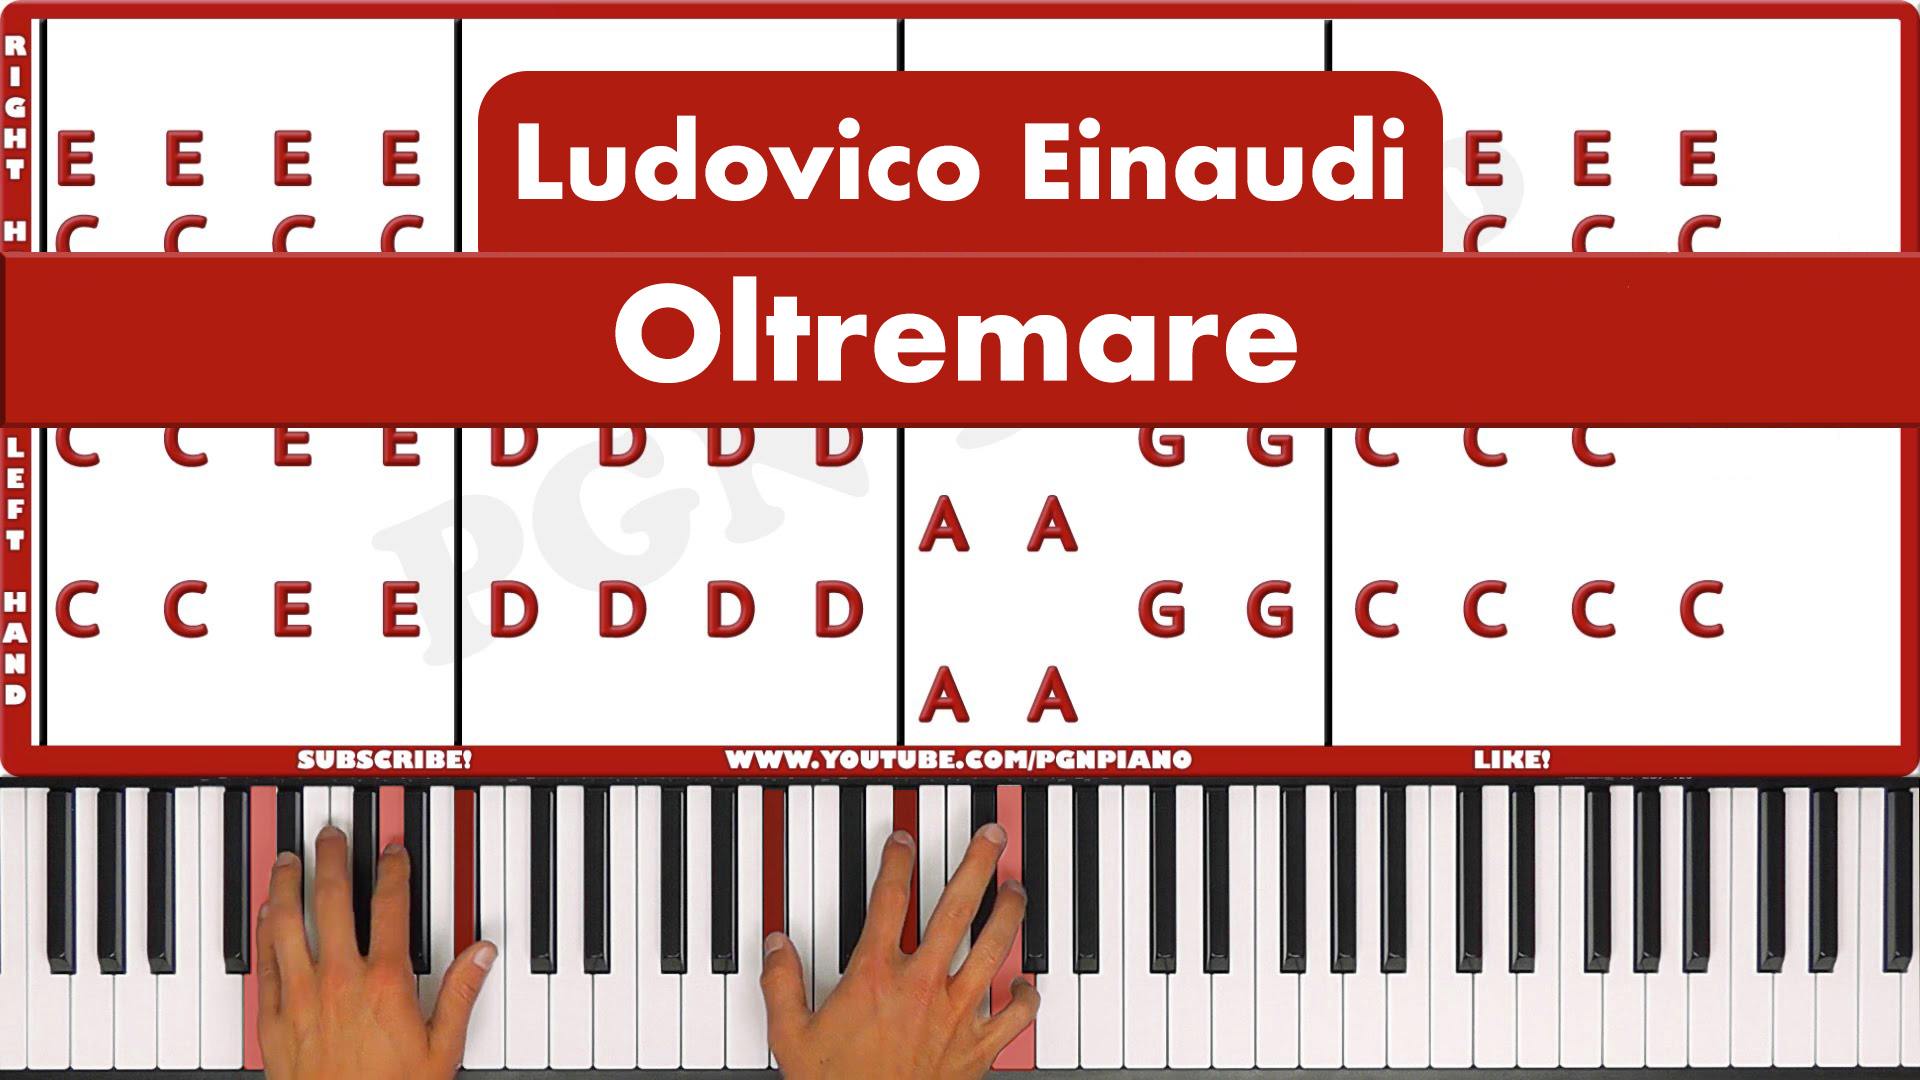 Ludovico Einaudi – Oltremare – Original